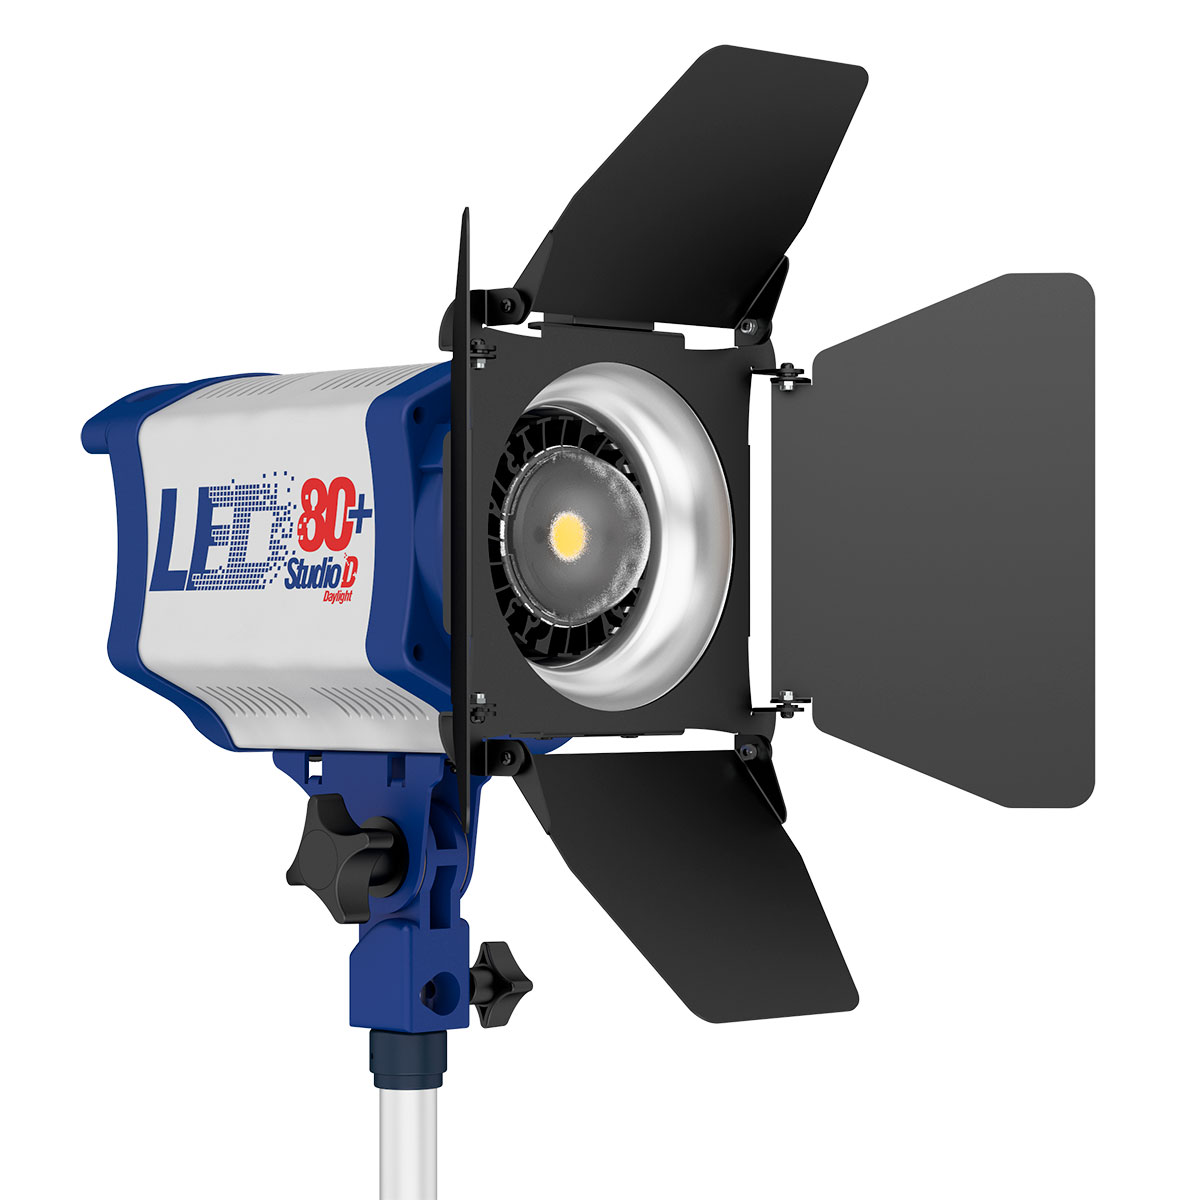 ILUMINADOR LED STUDIO 80+ DAYLIGHT V-LITE